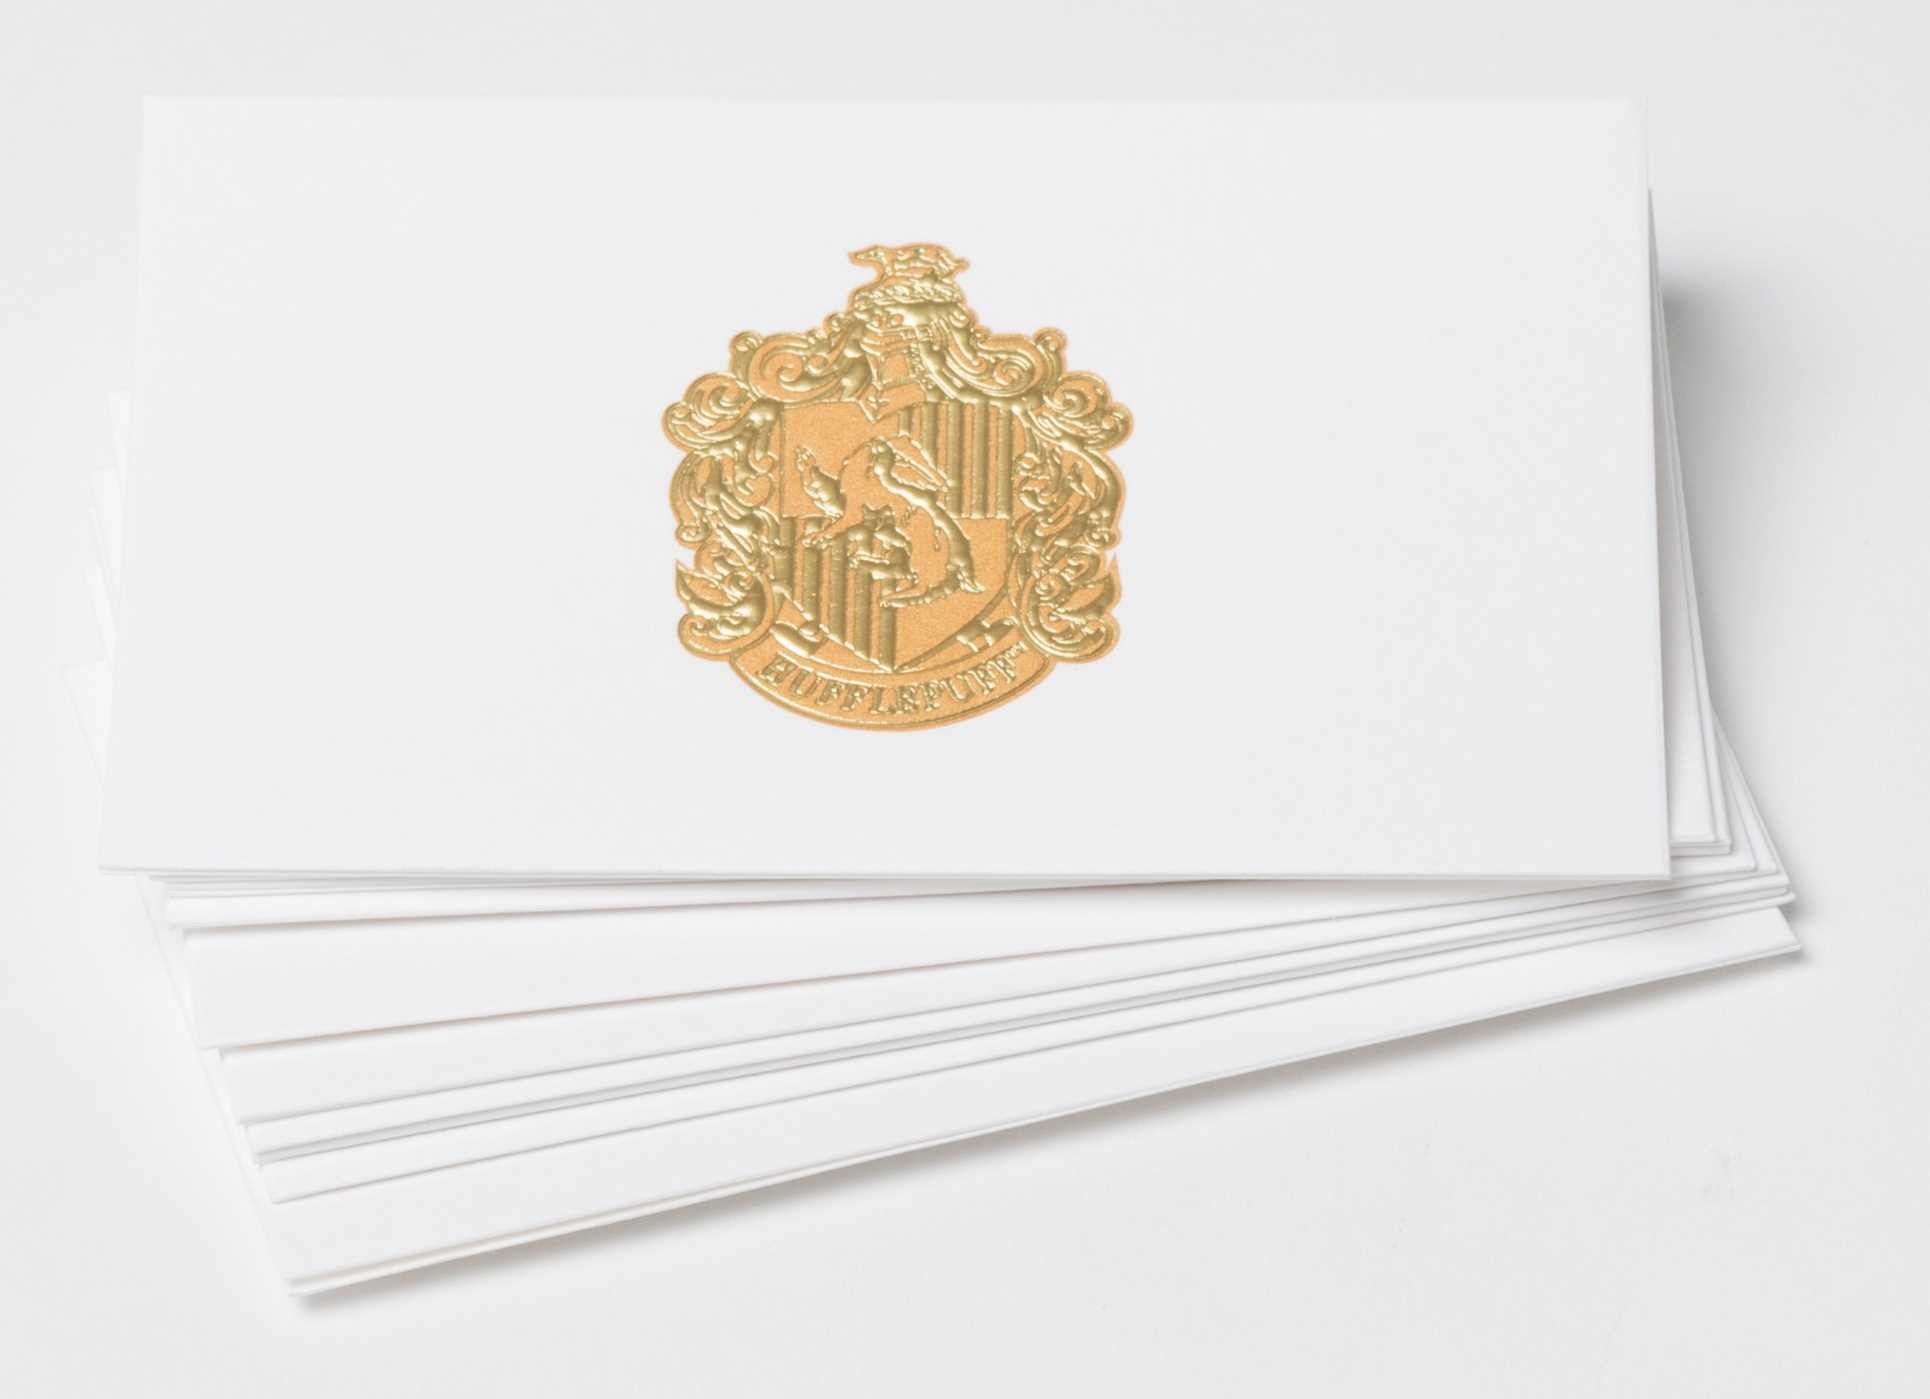 Harry potter hufflepuff crest foil gift enclosure cards set of 10 9781683832560.in01